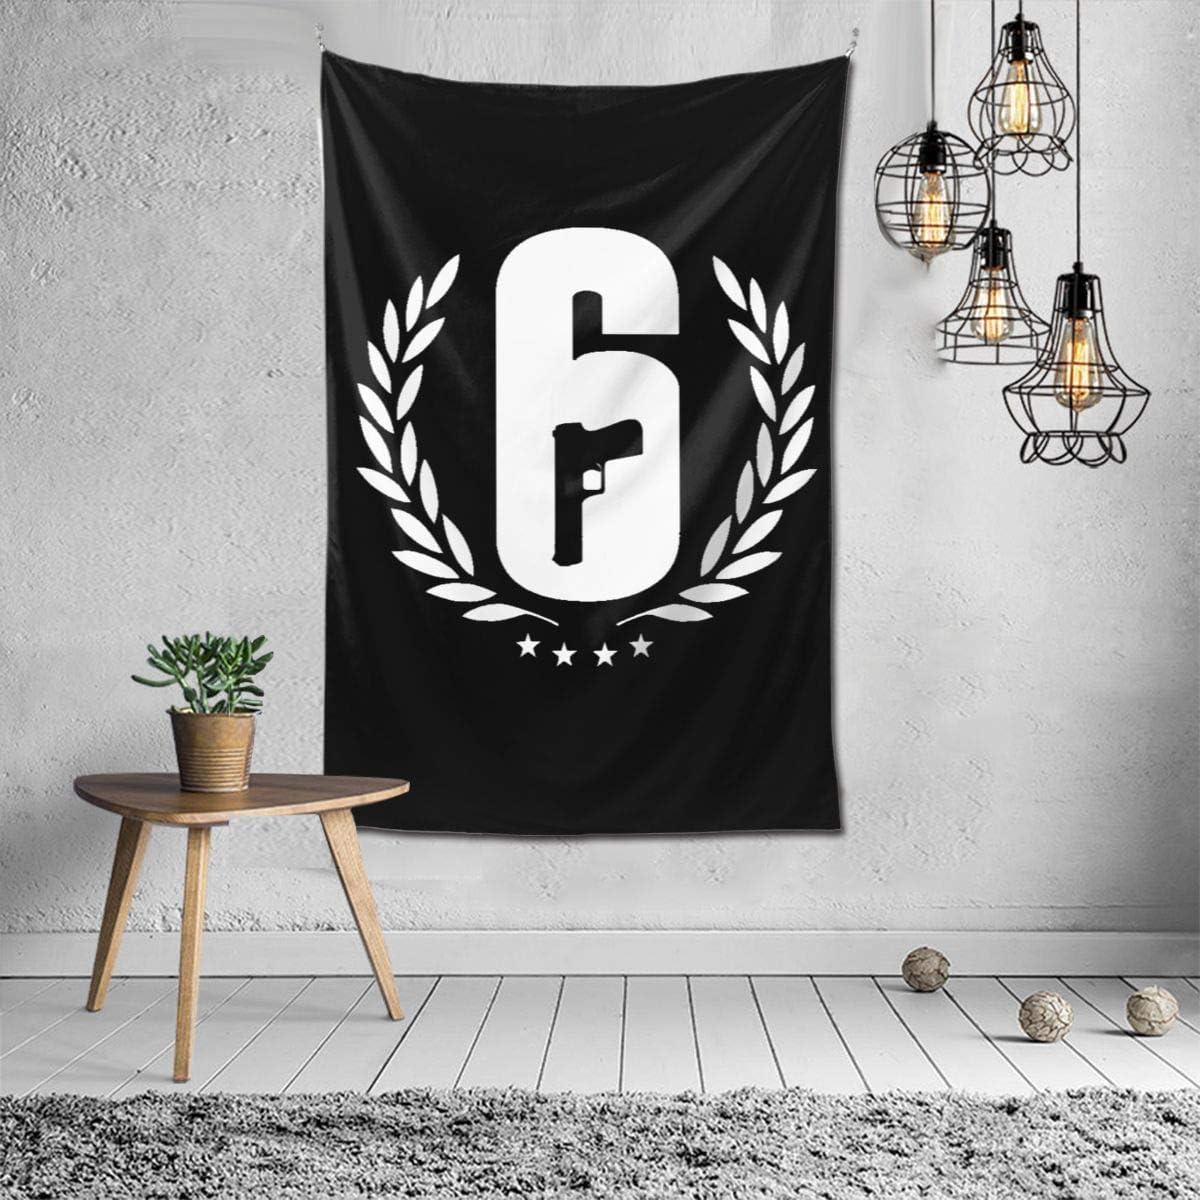 Uzila Rainbow Six Siege - Tapestry Wall Art Room Decor for Living Room Bed Room Wall Hanging 40x60 Picnic Blanket Beach Towel